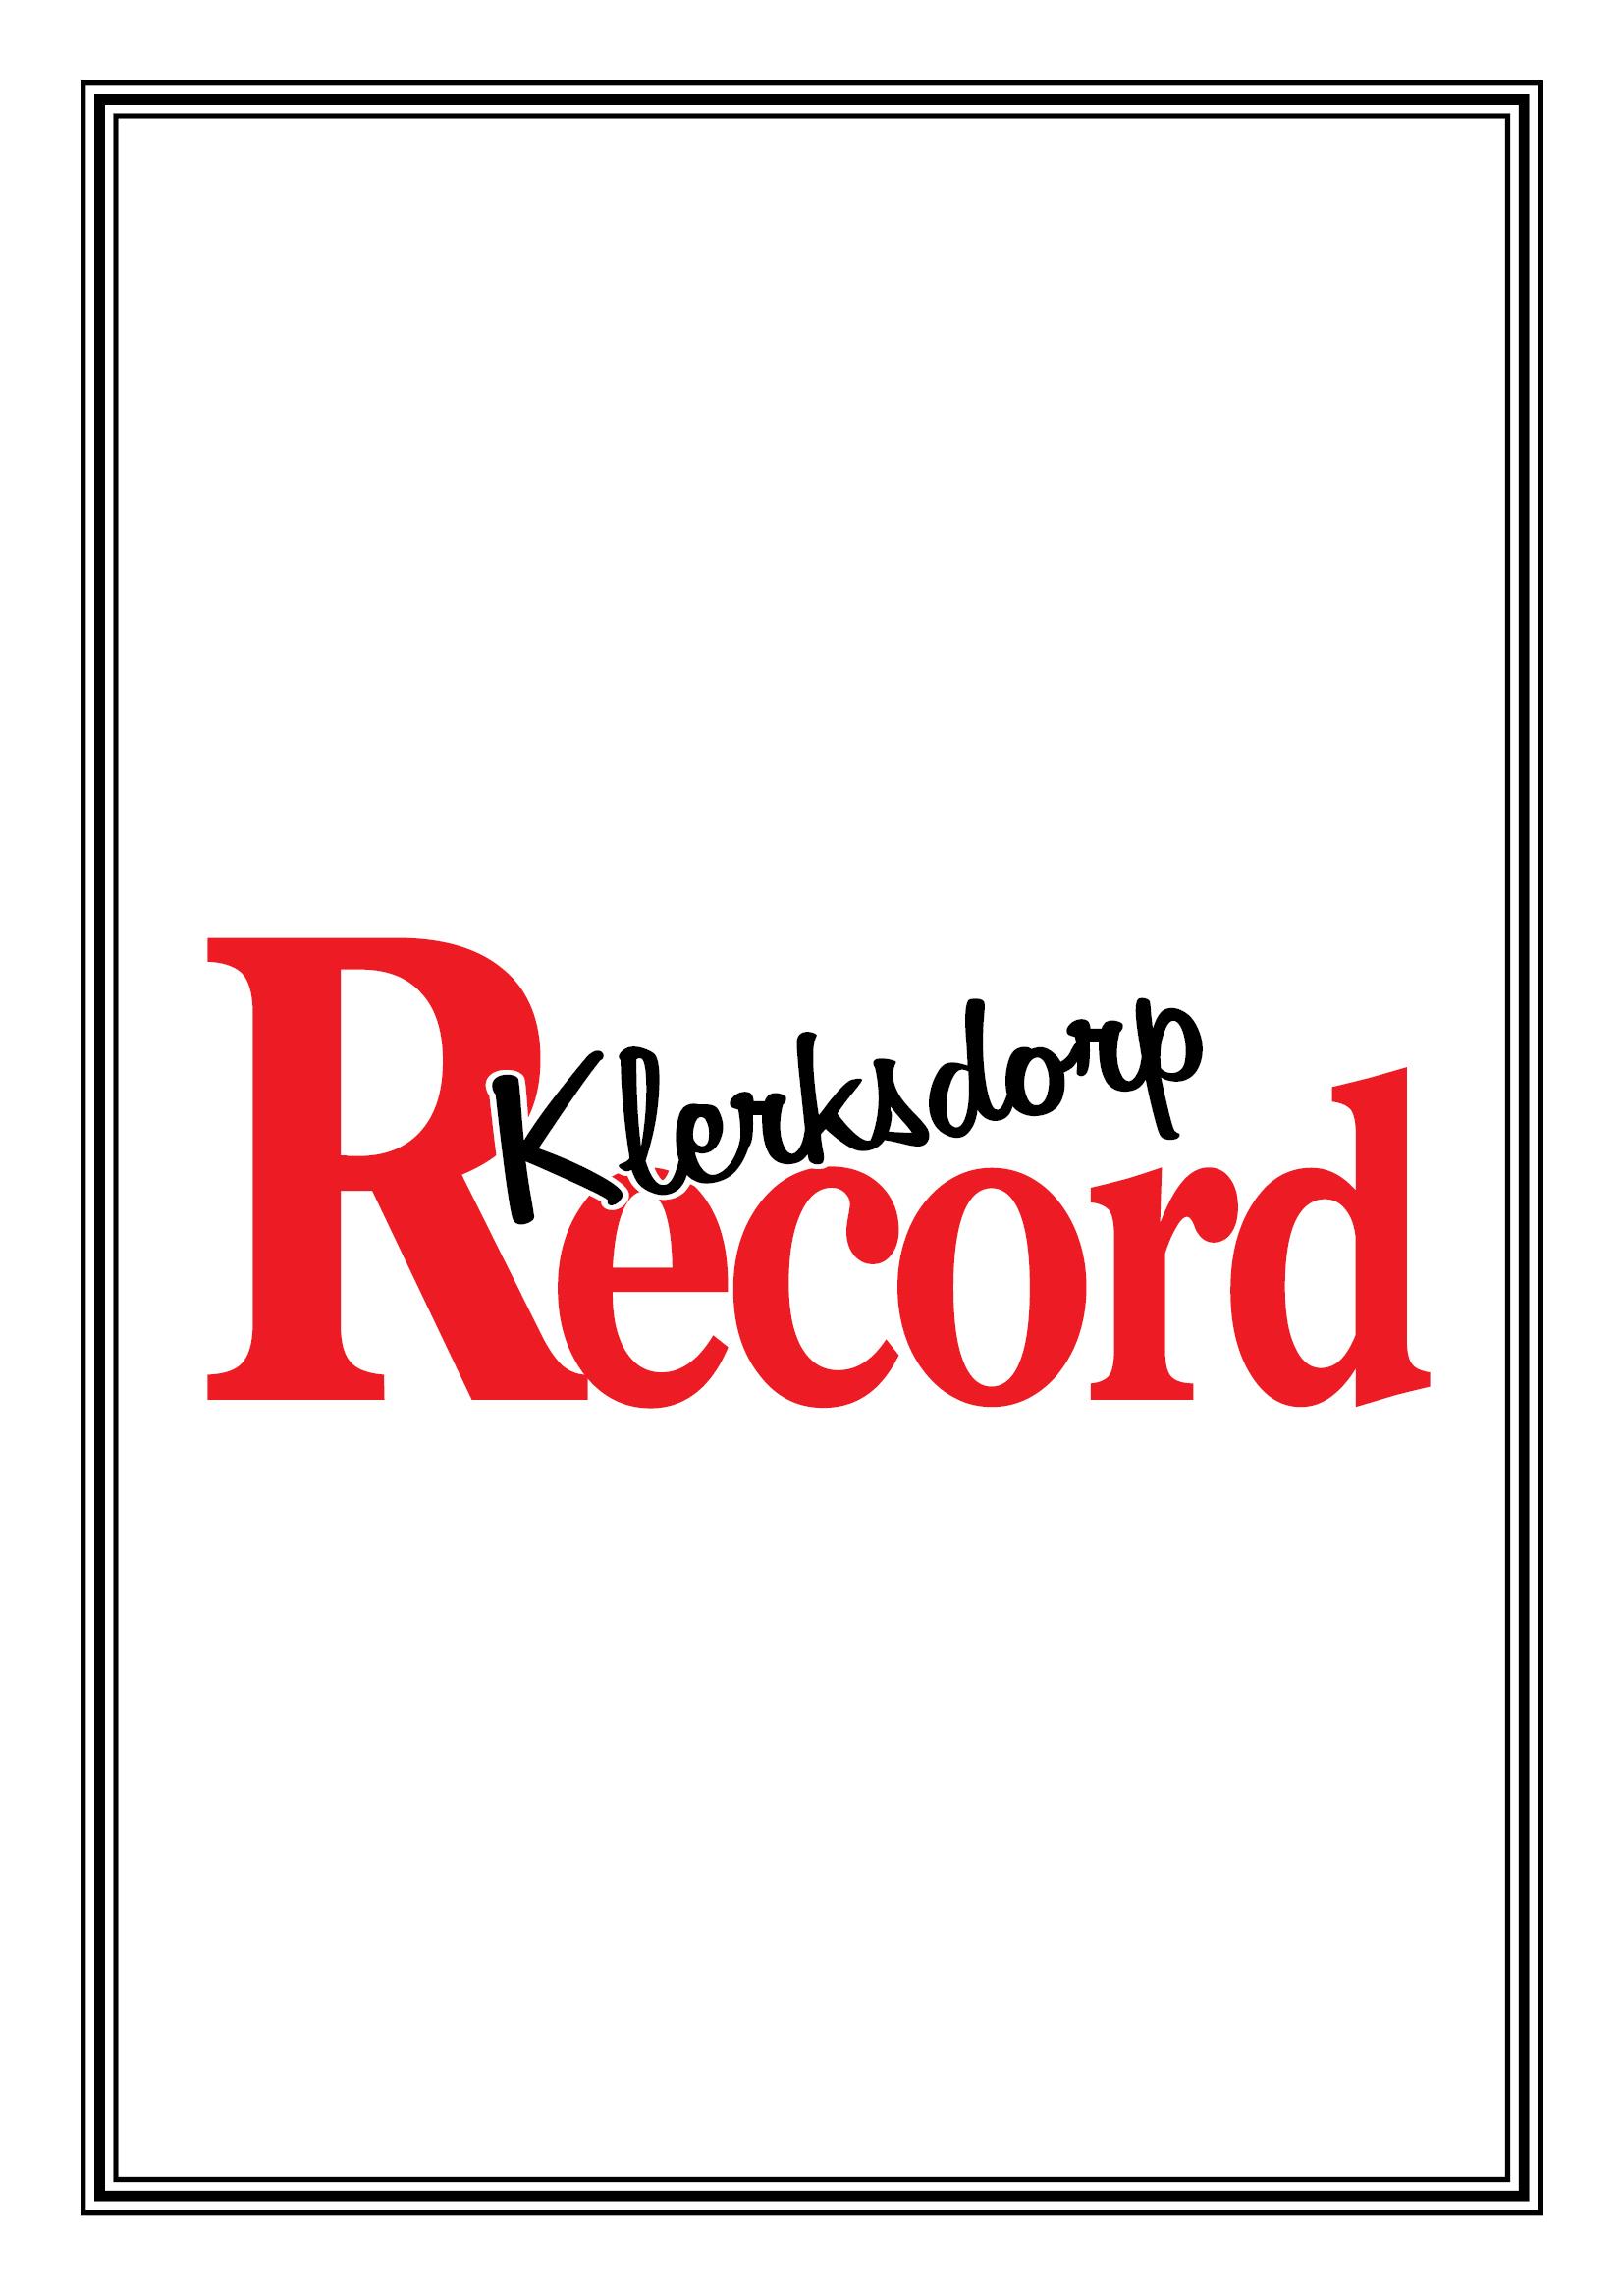 Klerksdorp Record